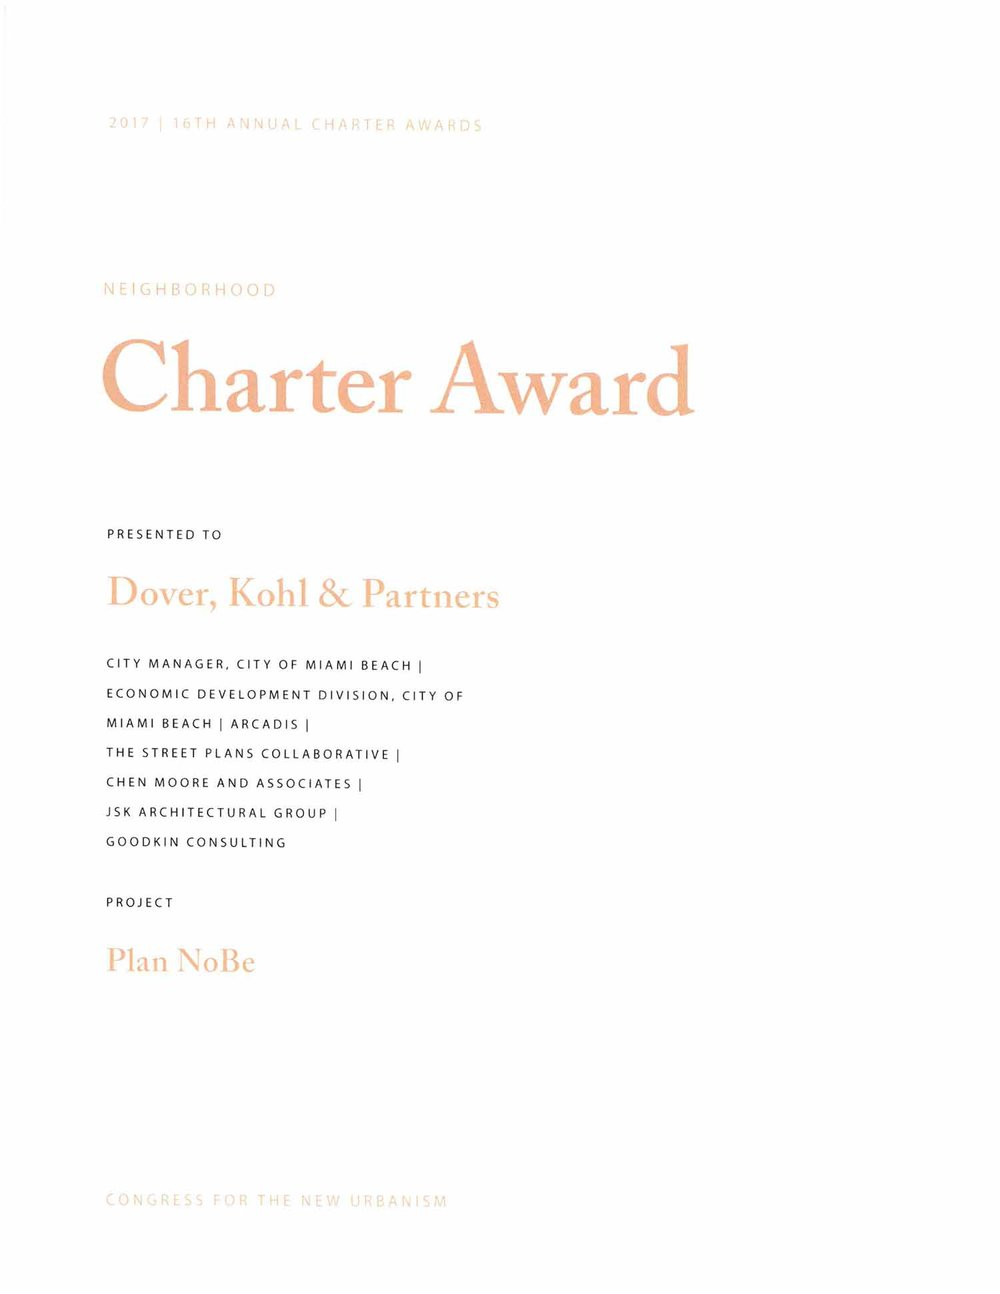 2017-Charter Award- Plan Nobe.jpg